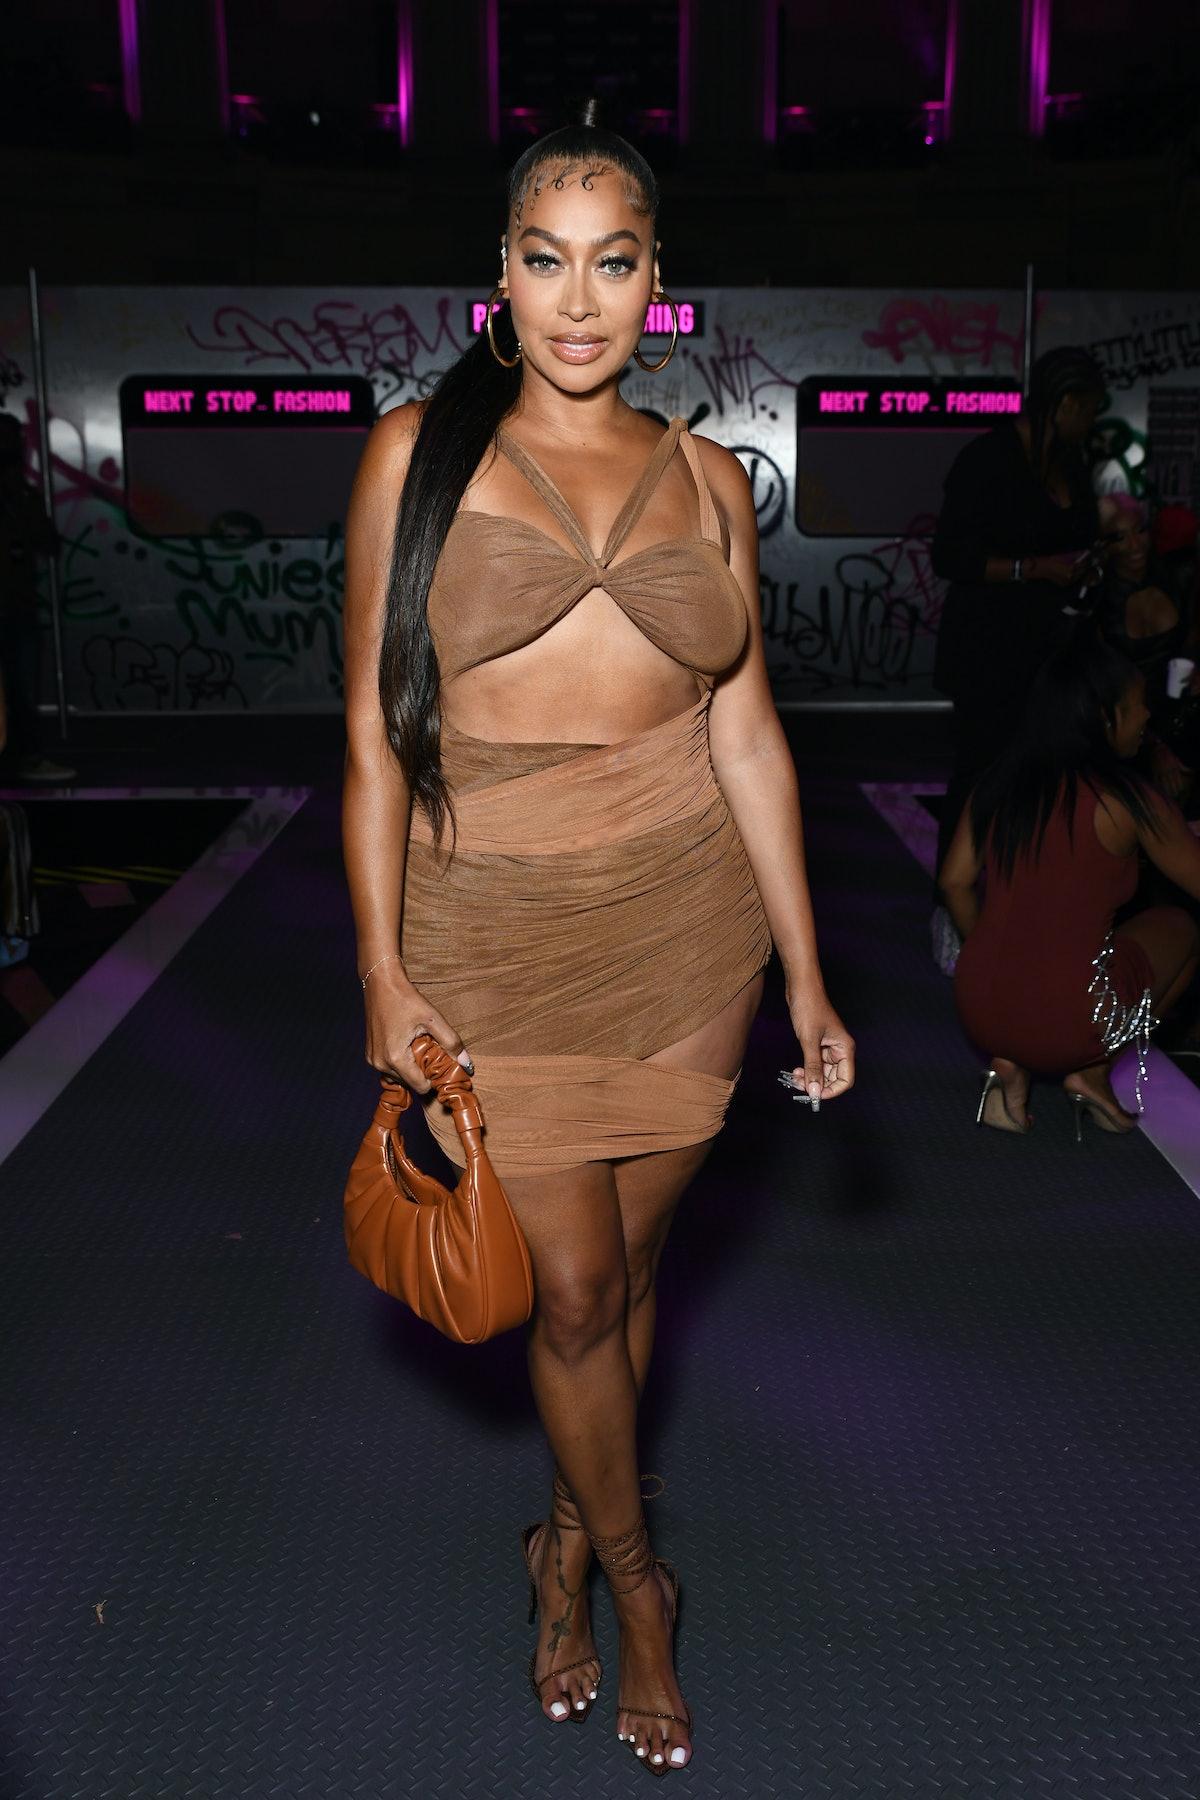 La La Anthony attends PrettyLittleThing: Teyana Taylor Collection II New York Fashion Week on Septem...